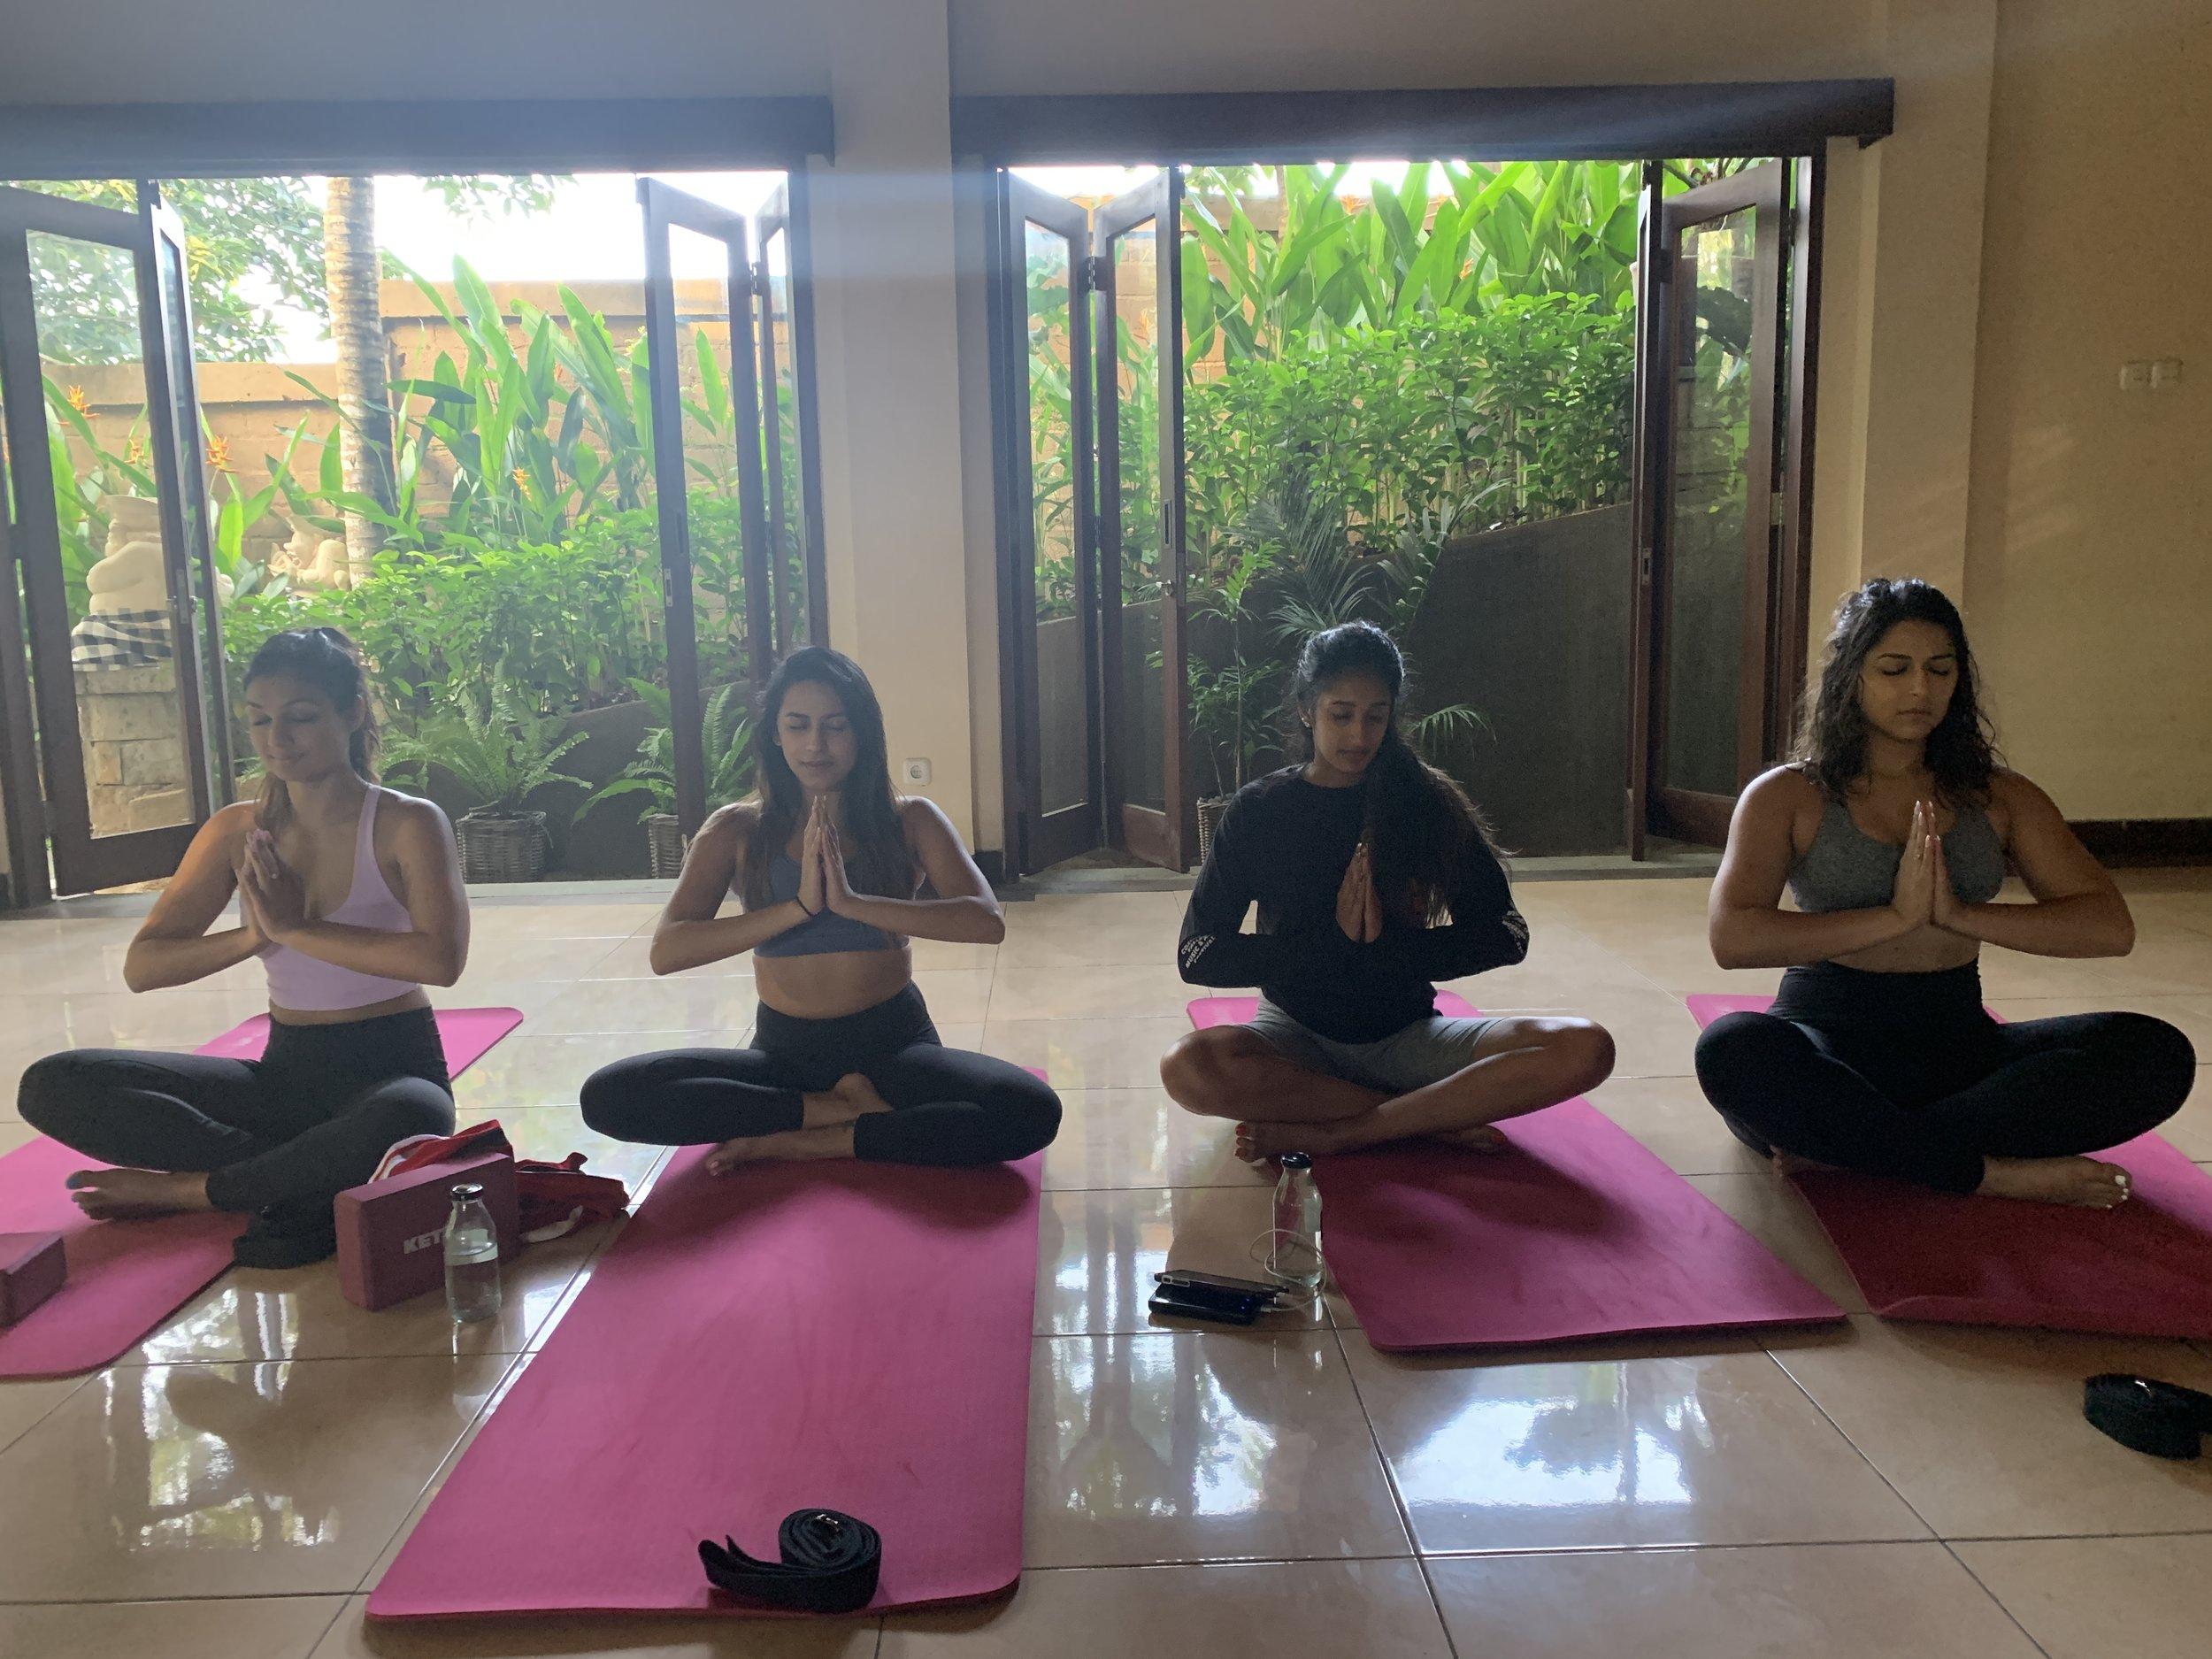 Sunrise yoga at 7 AM courtesy of our resort!